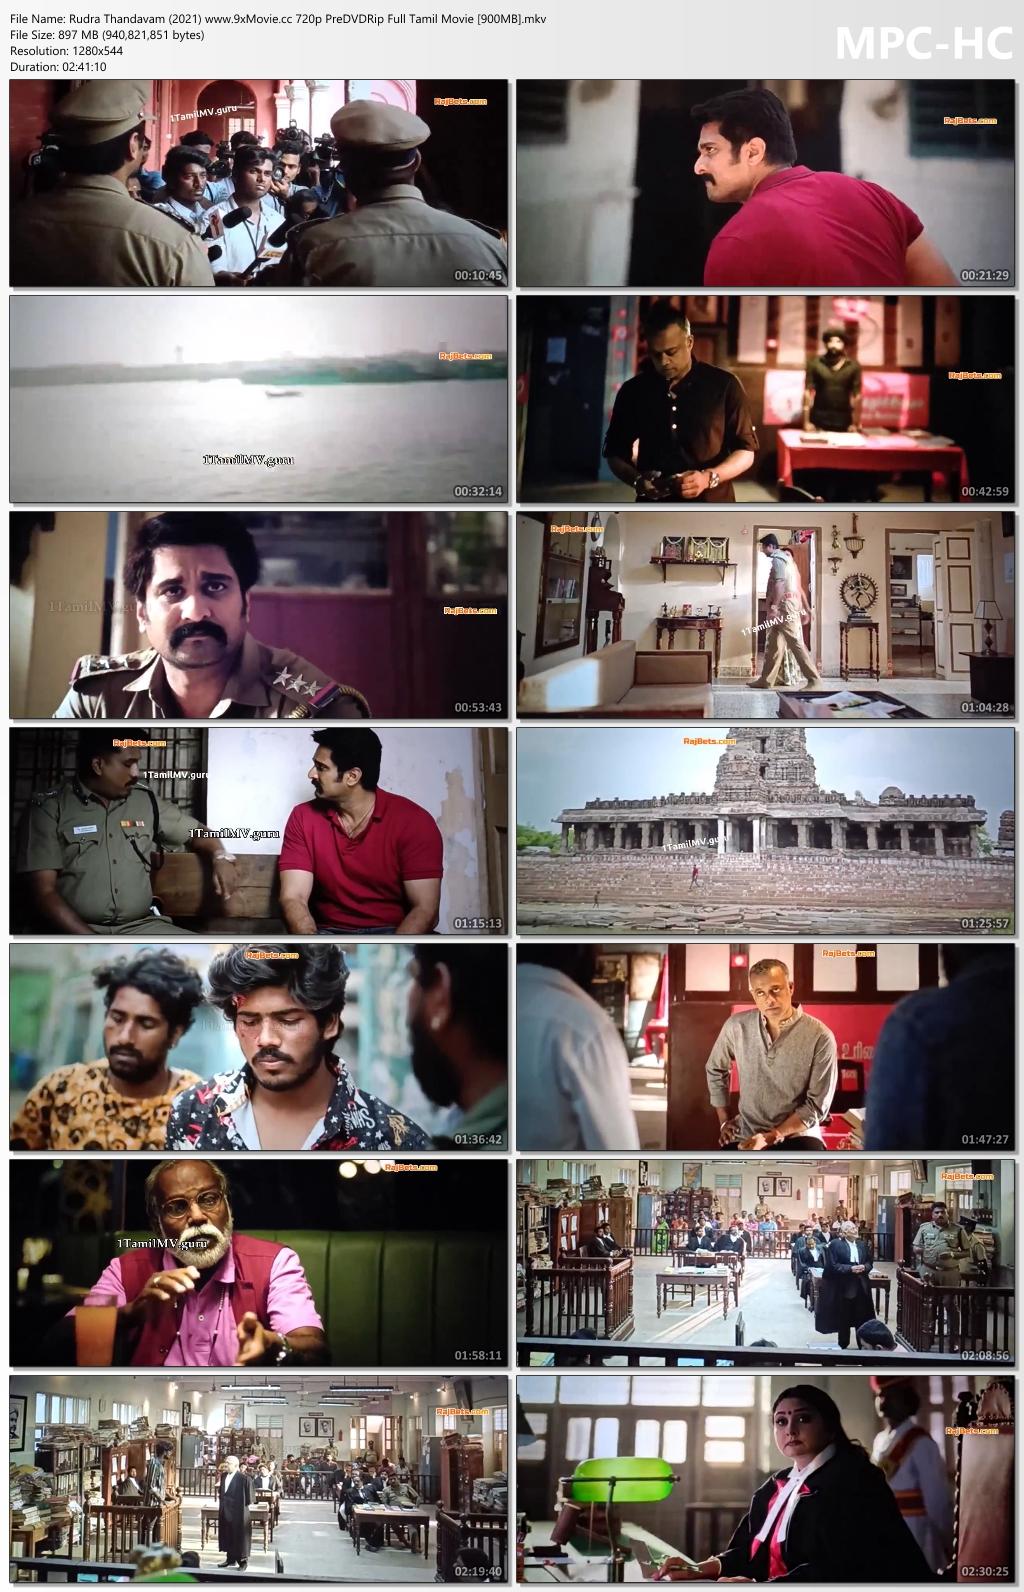 Rudra-Thandavam-2021-www-9x-Movie-cc-720p-Pre-DVDRip-Full-Tamil-Movie-900-MB-mkv